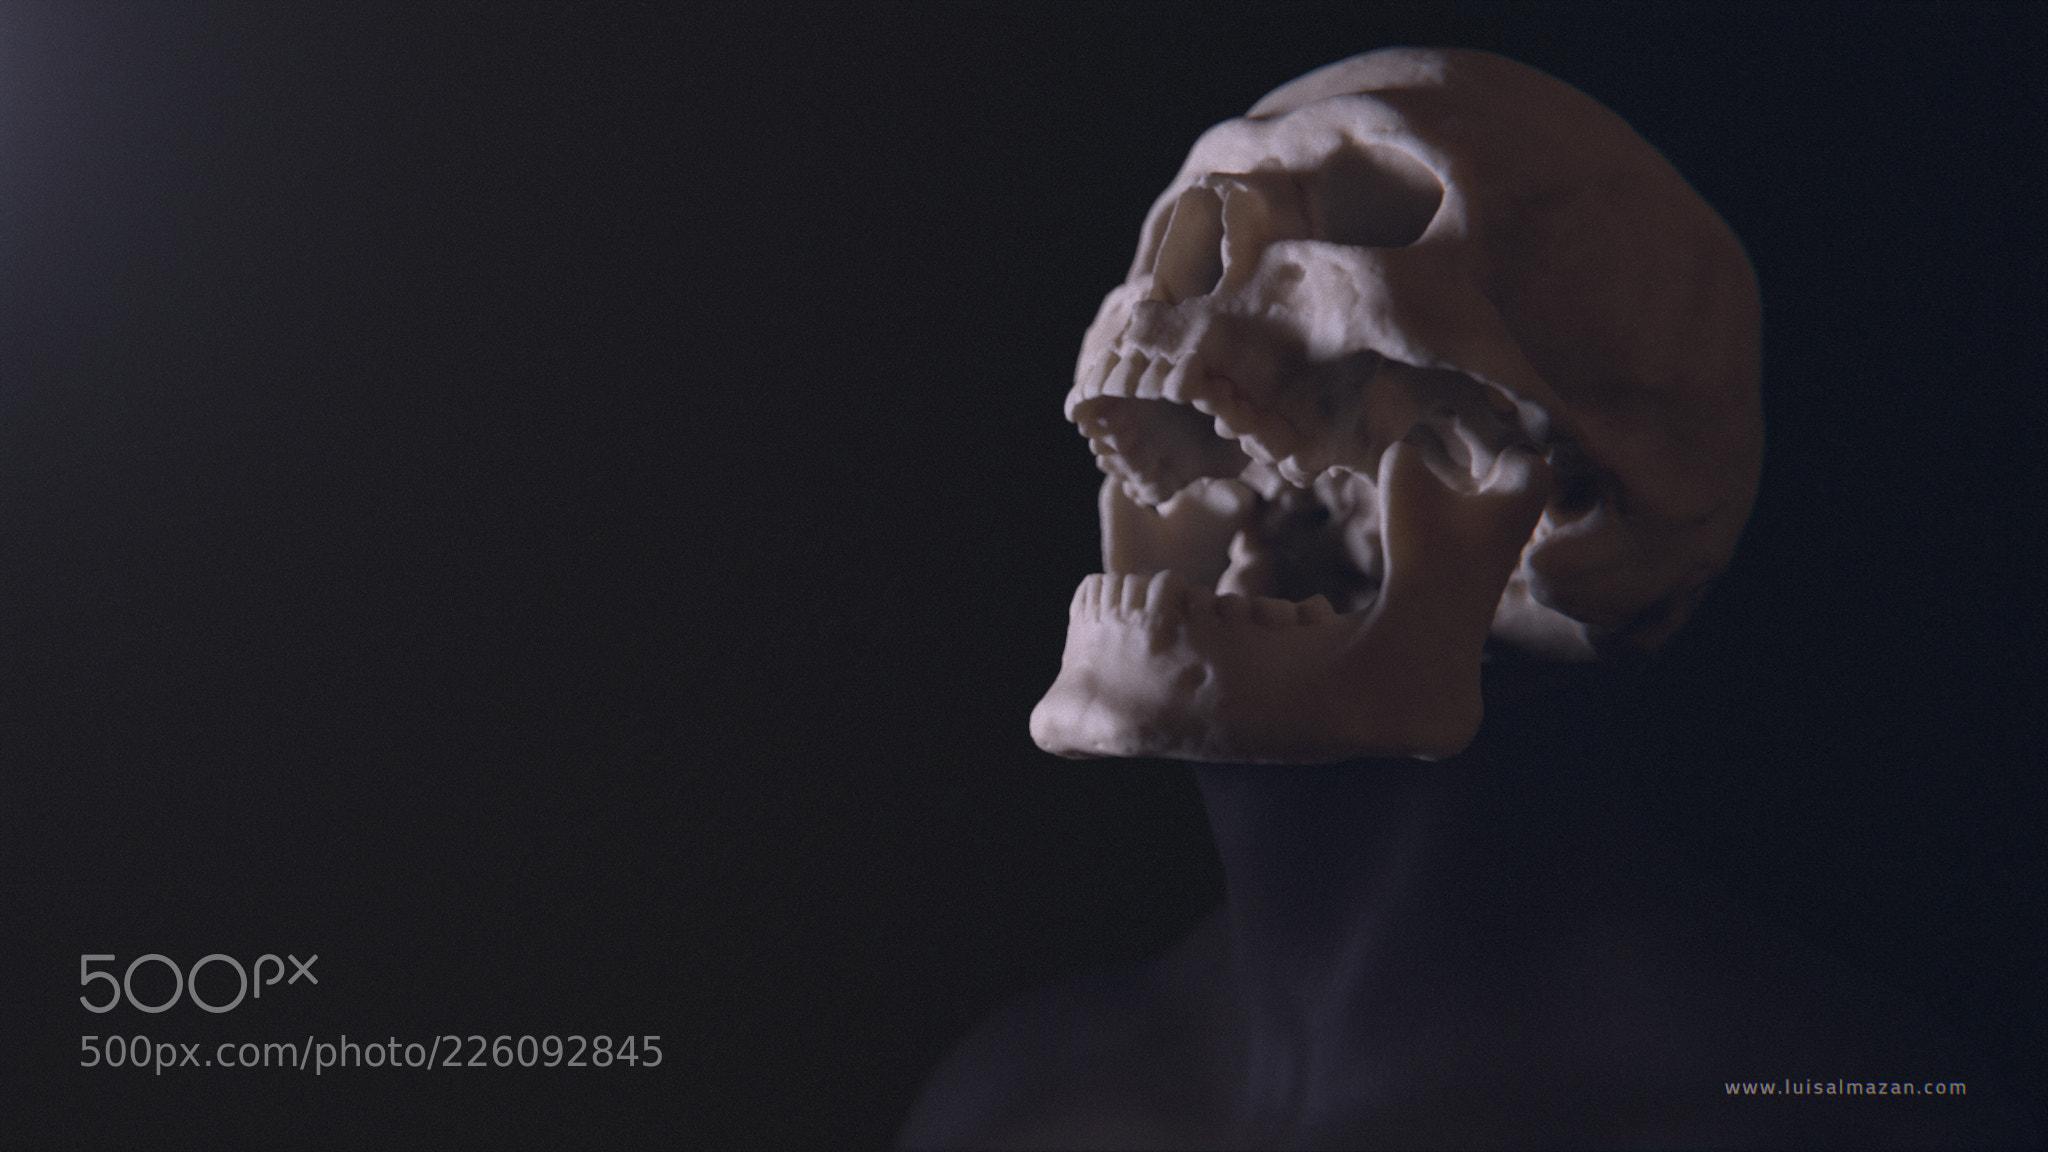 skull Yayauhqui comp v002